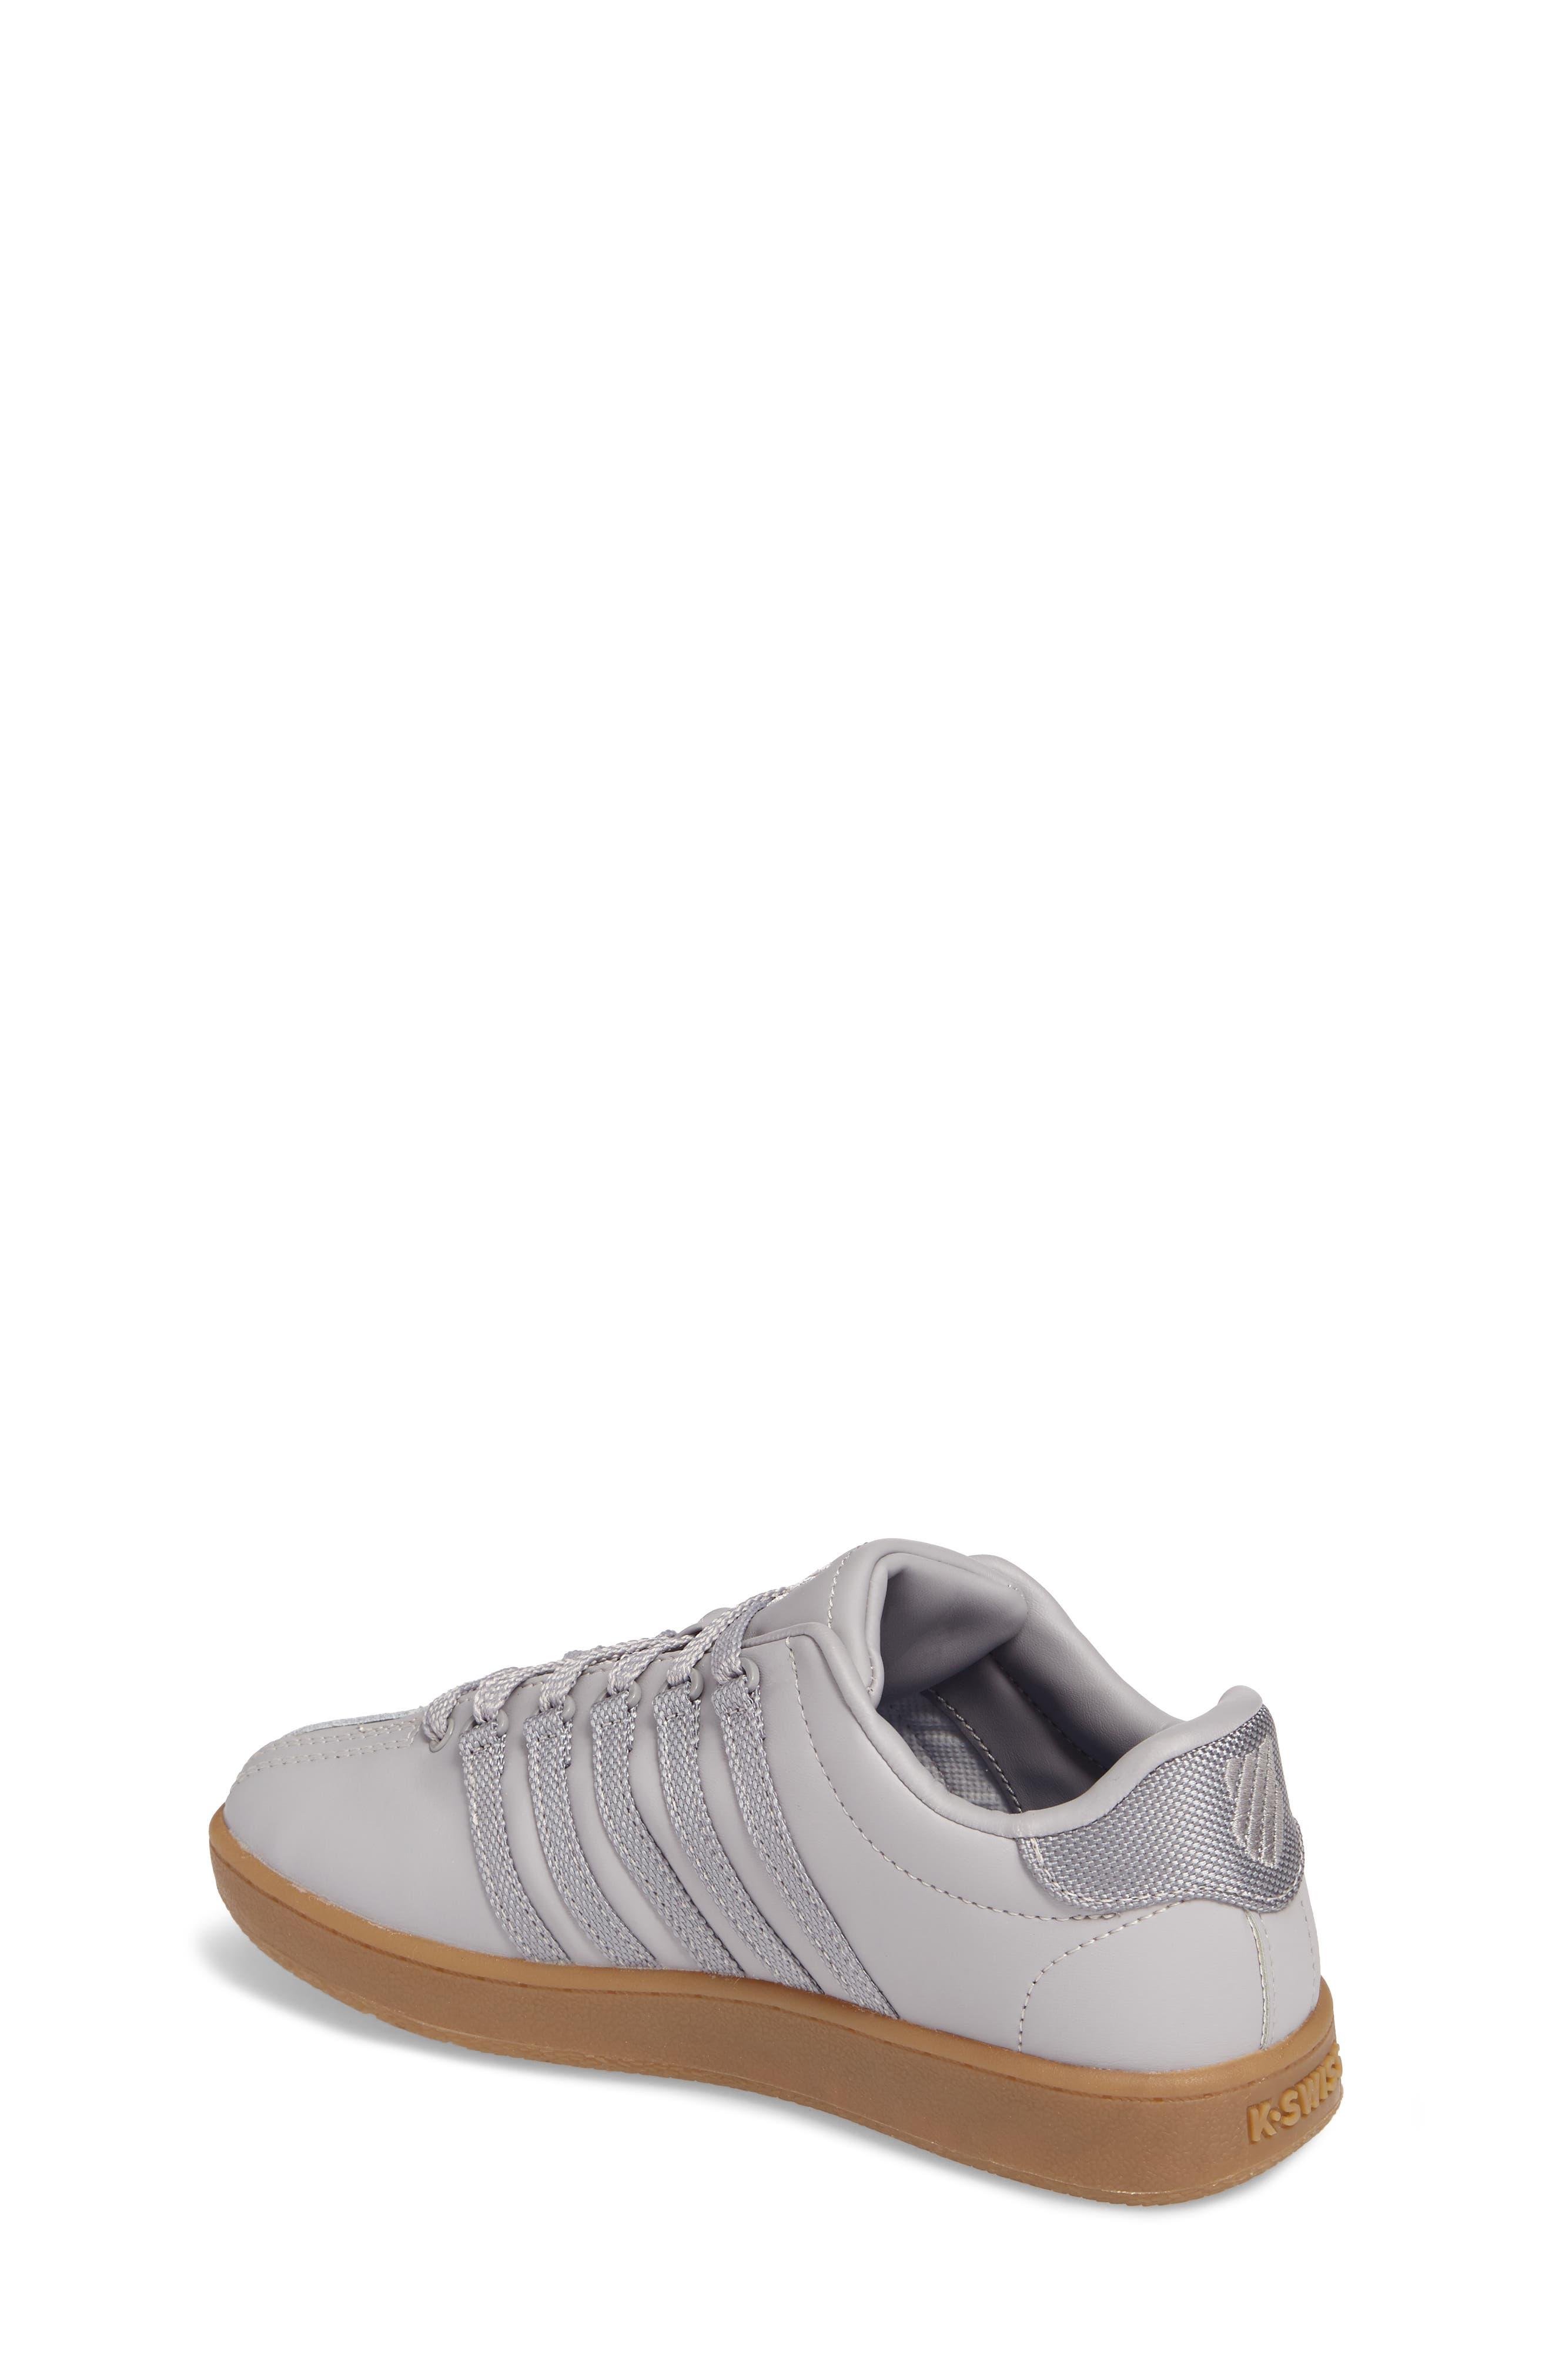 'Classic' Sneaker,                             Alternate thumbnail 11, color,